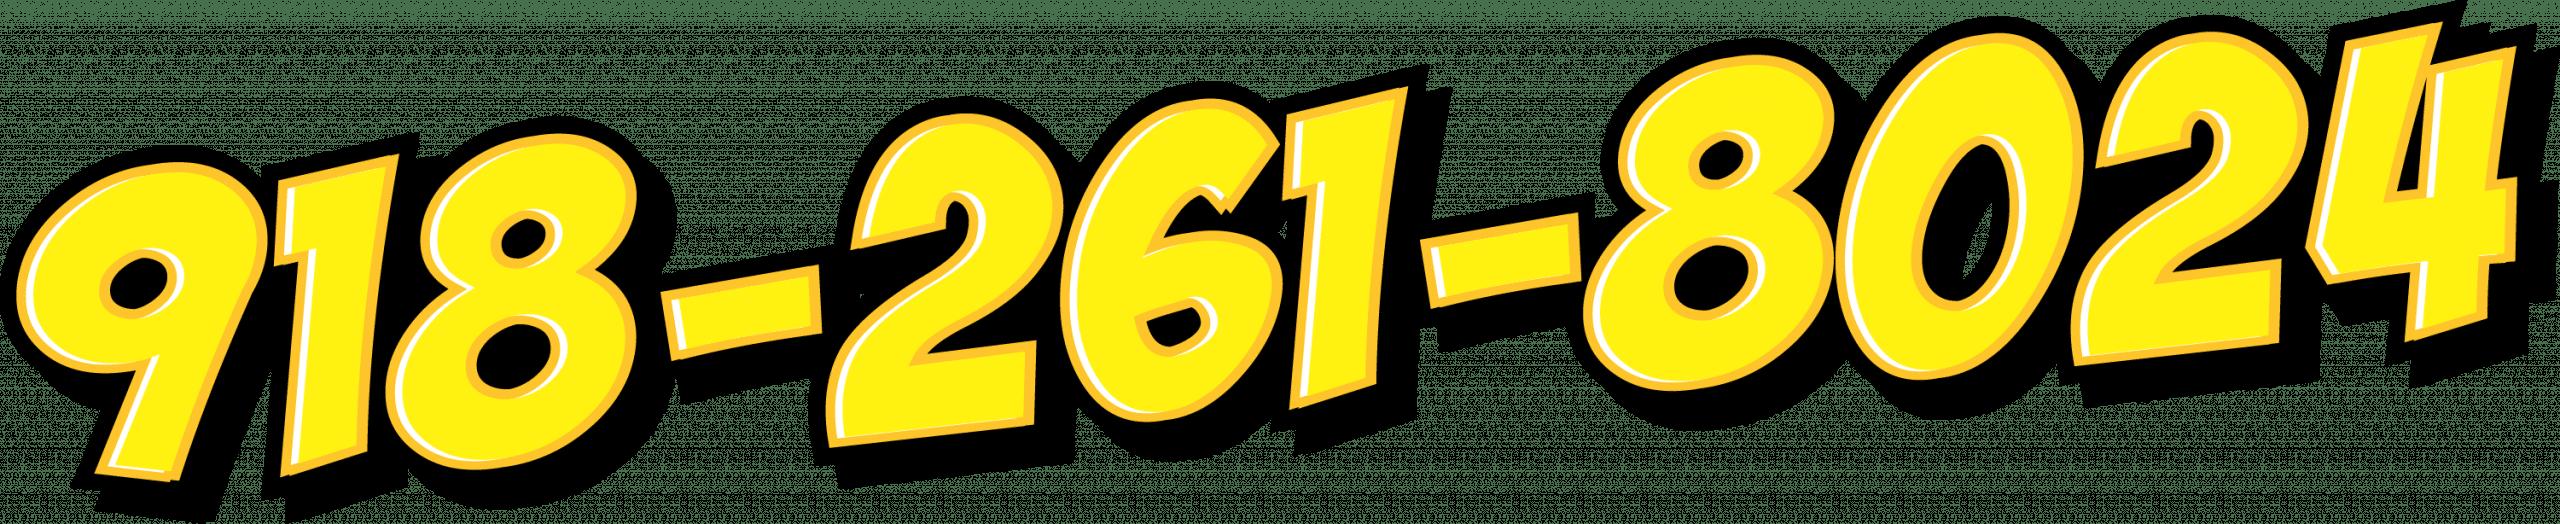 918-261-8024